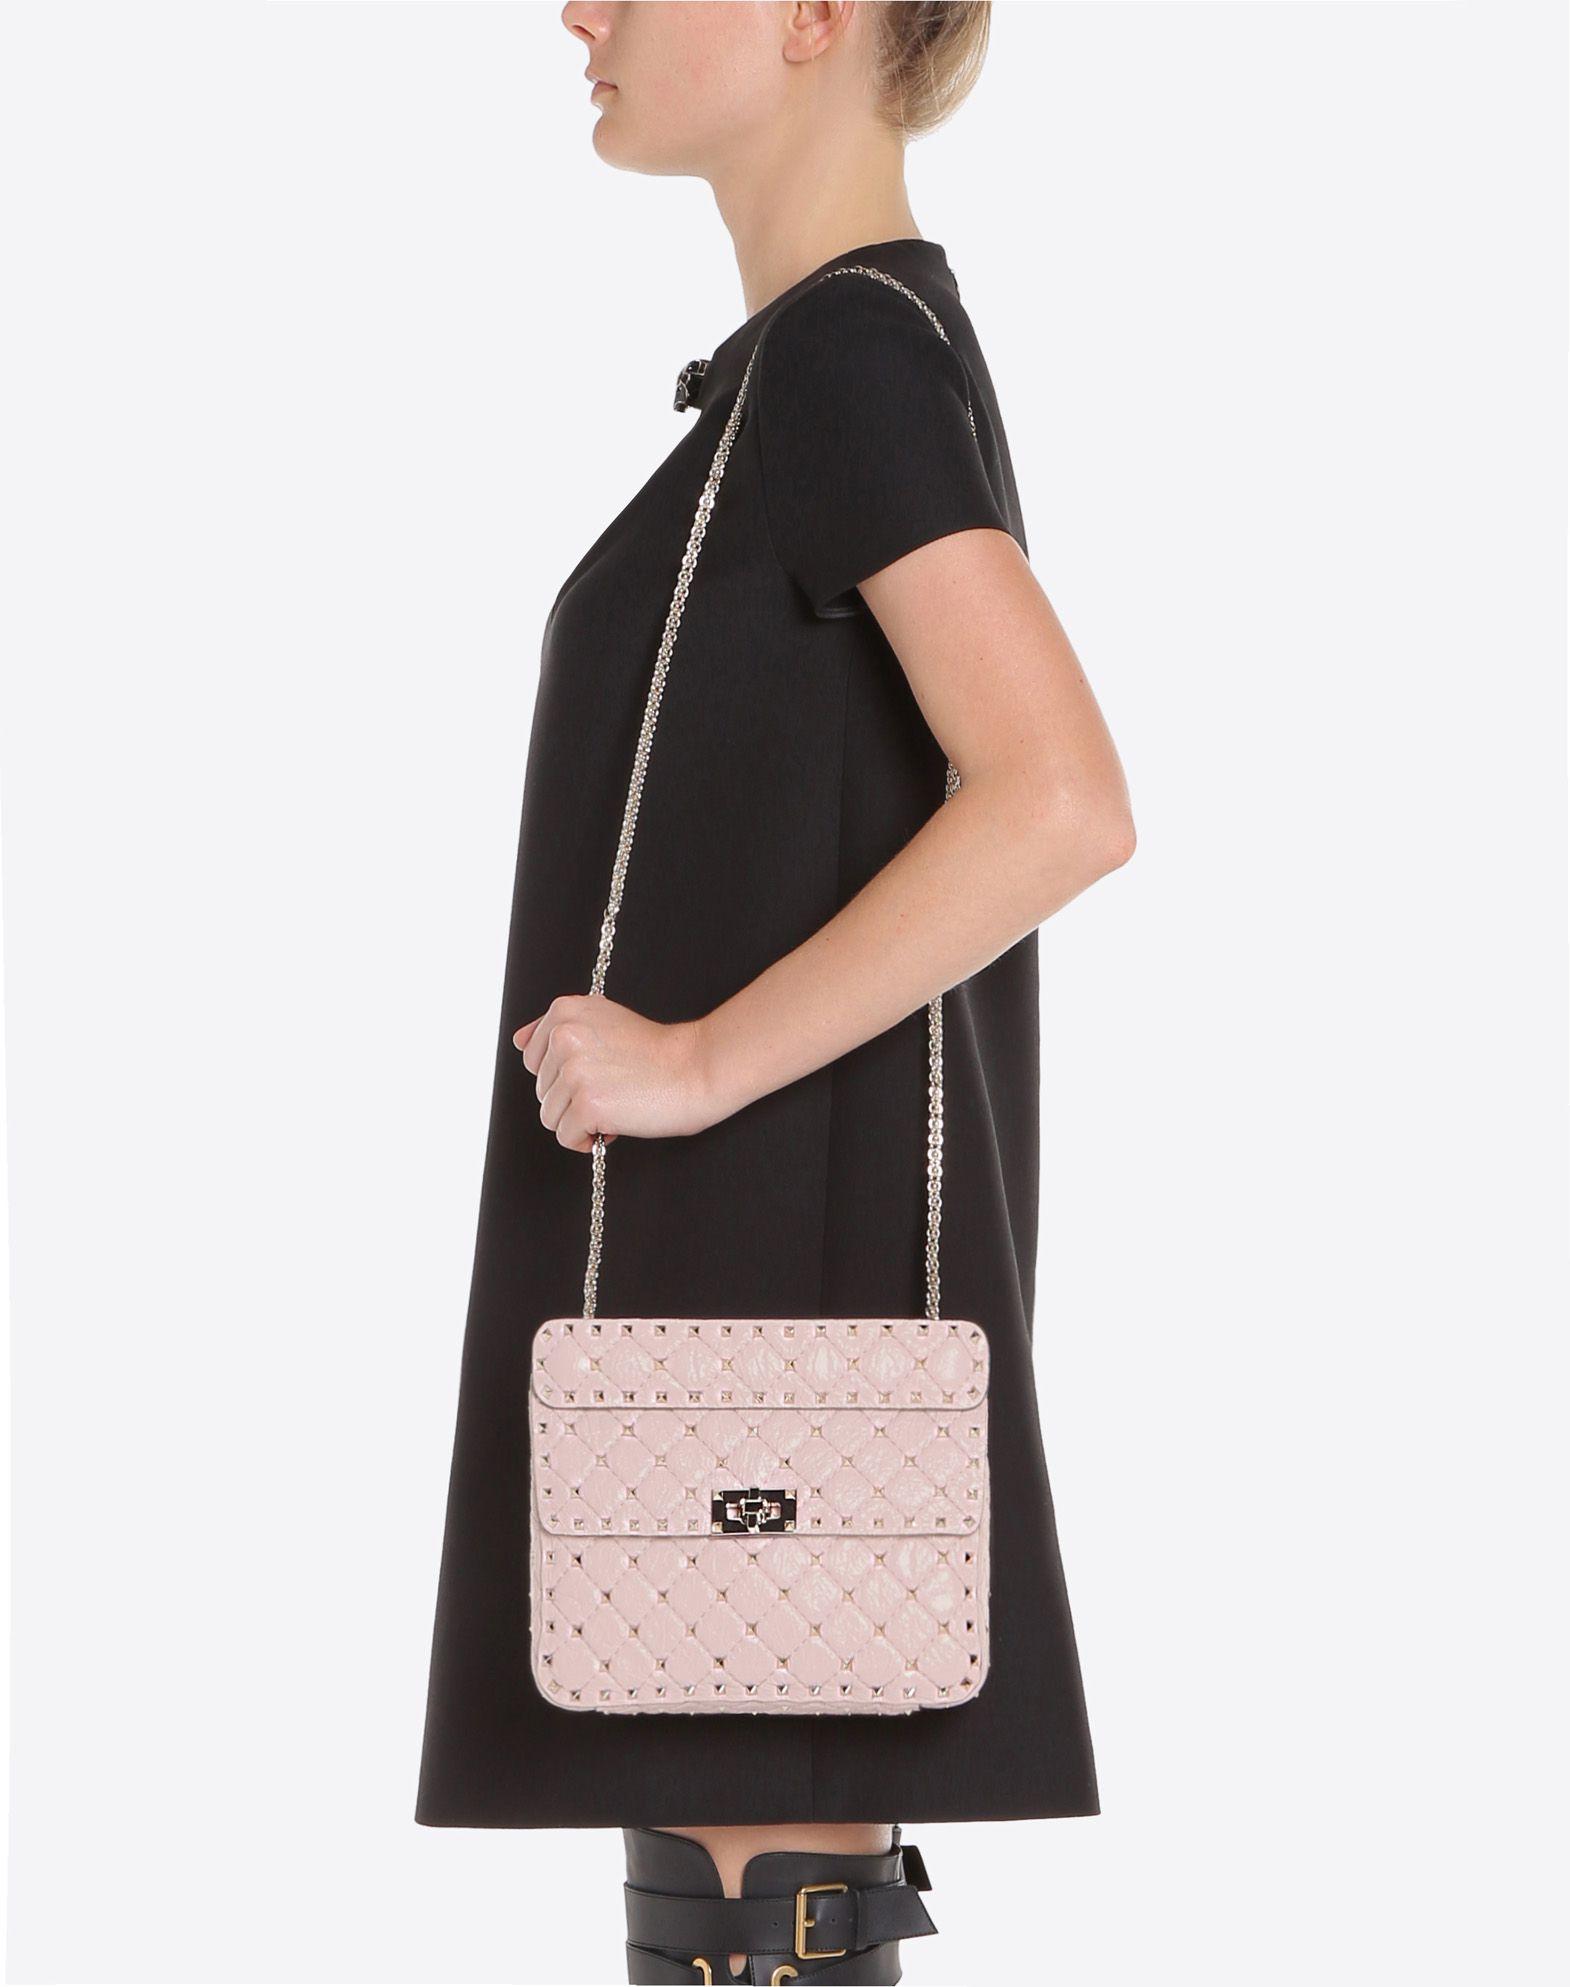 VALENTINO GARAVANI Rockstud Spike Medium Chain Bag Shoulder bag D a